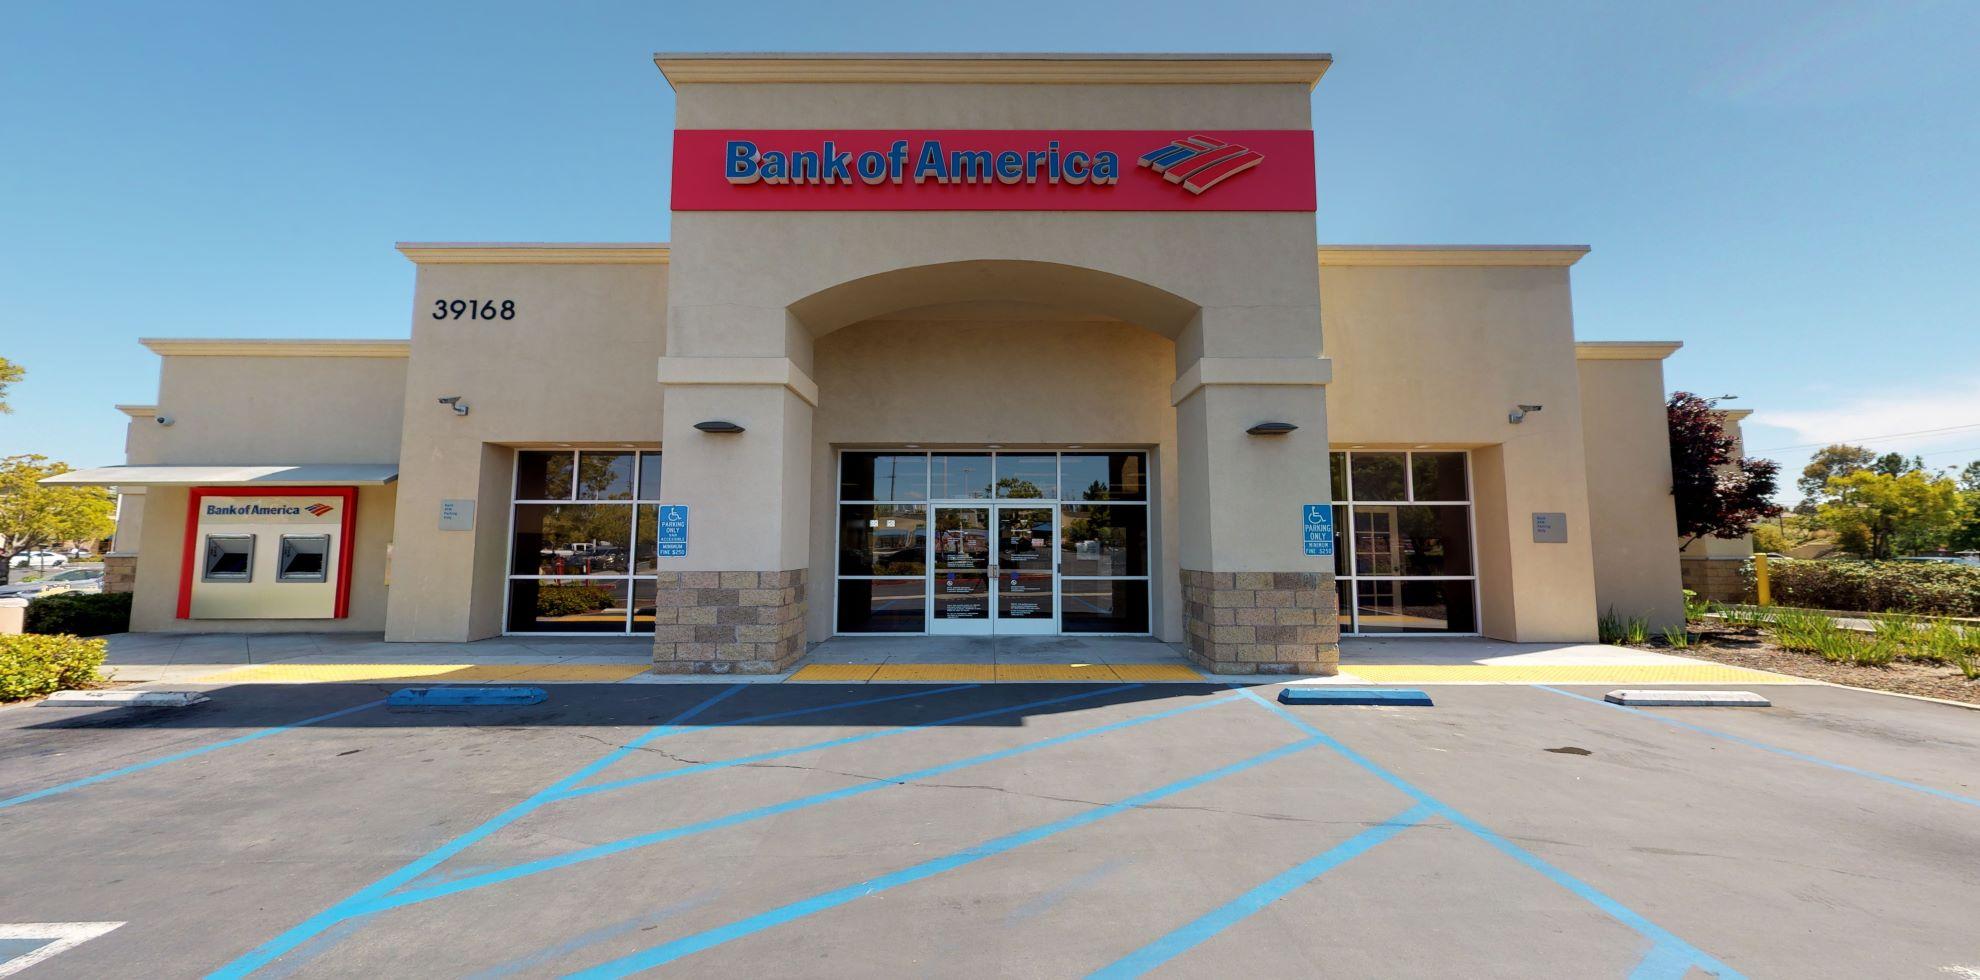 Bank of America financial center with drive-thru ATM | 39168 Winchester Rd, Murrieta, CA 92563